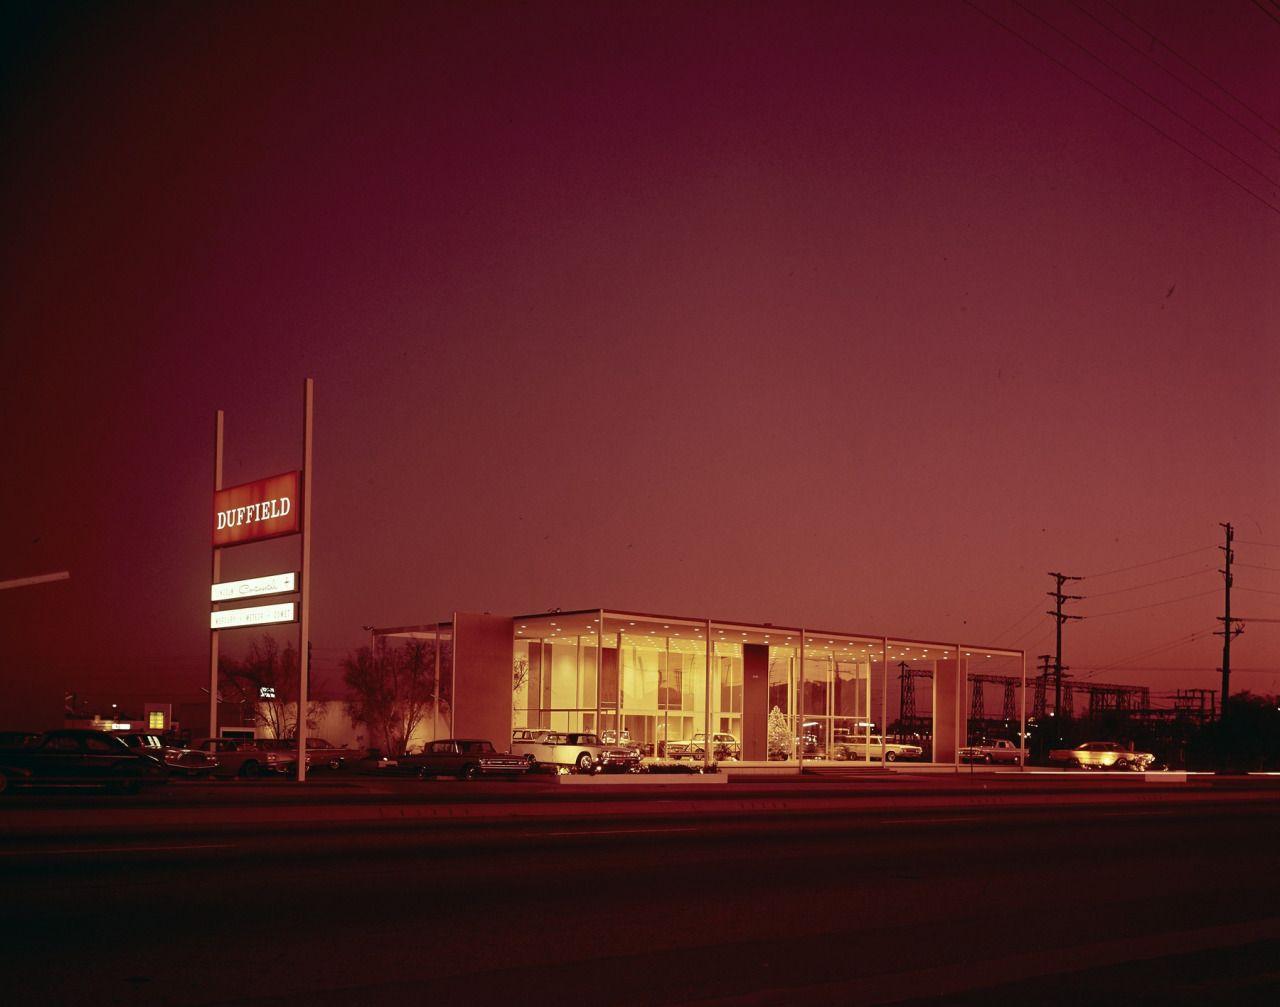 1963 duffield lincolnmercury dealership showroom long